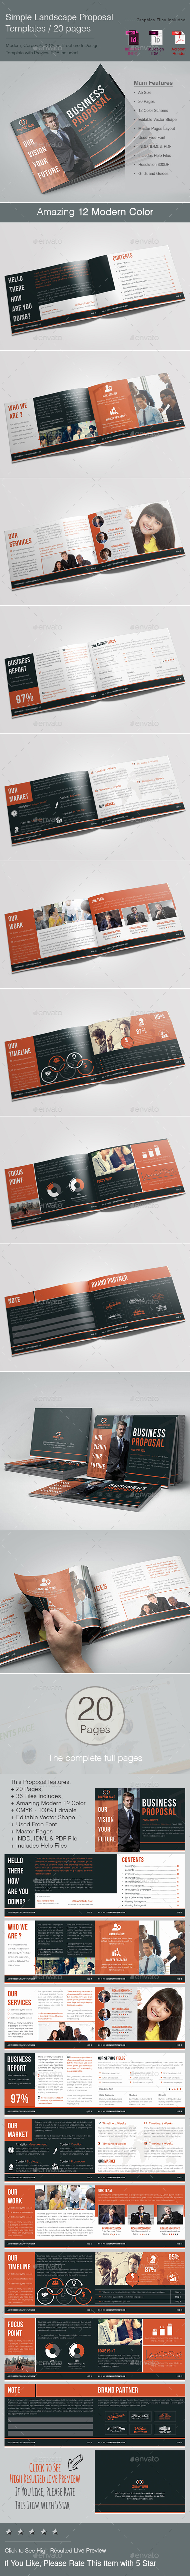 Simple Landscape Proposal Templates - Corporate Brochures